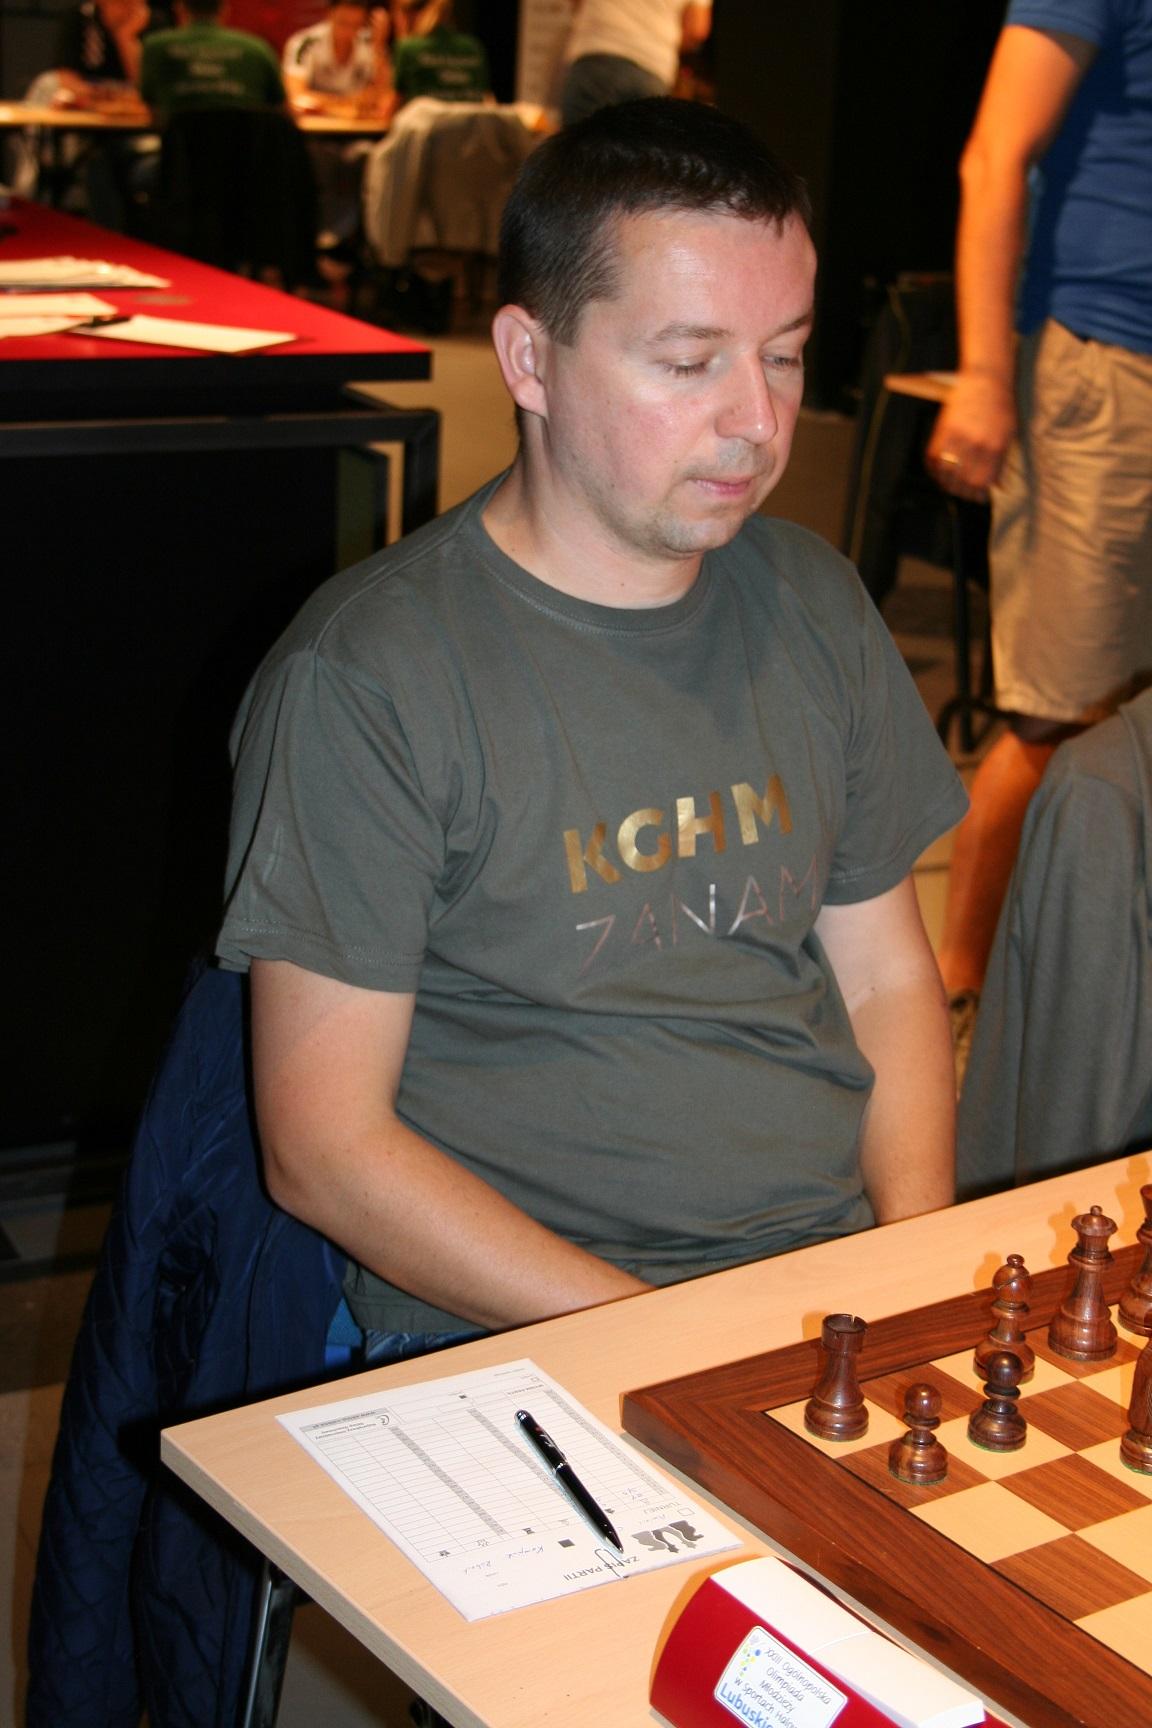 GM Robert Kempiński